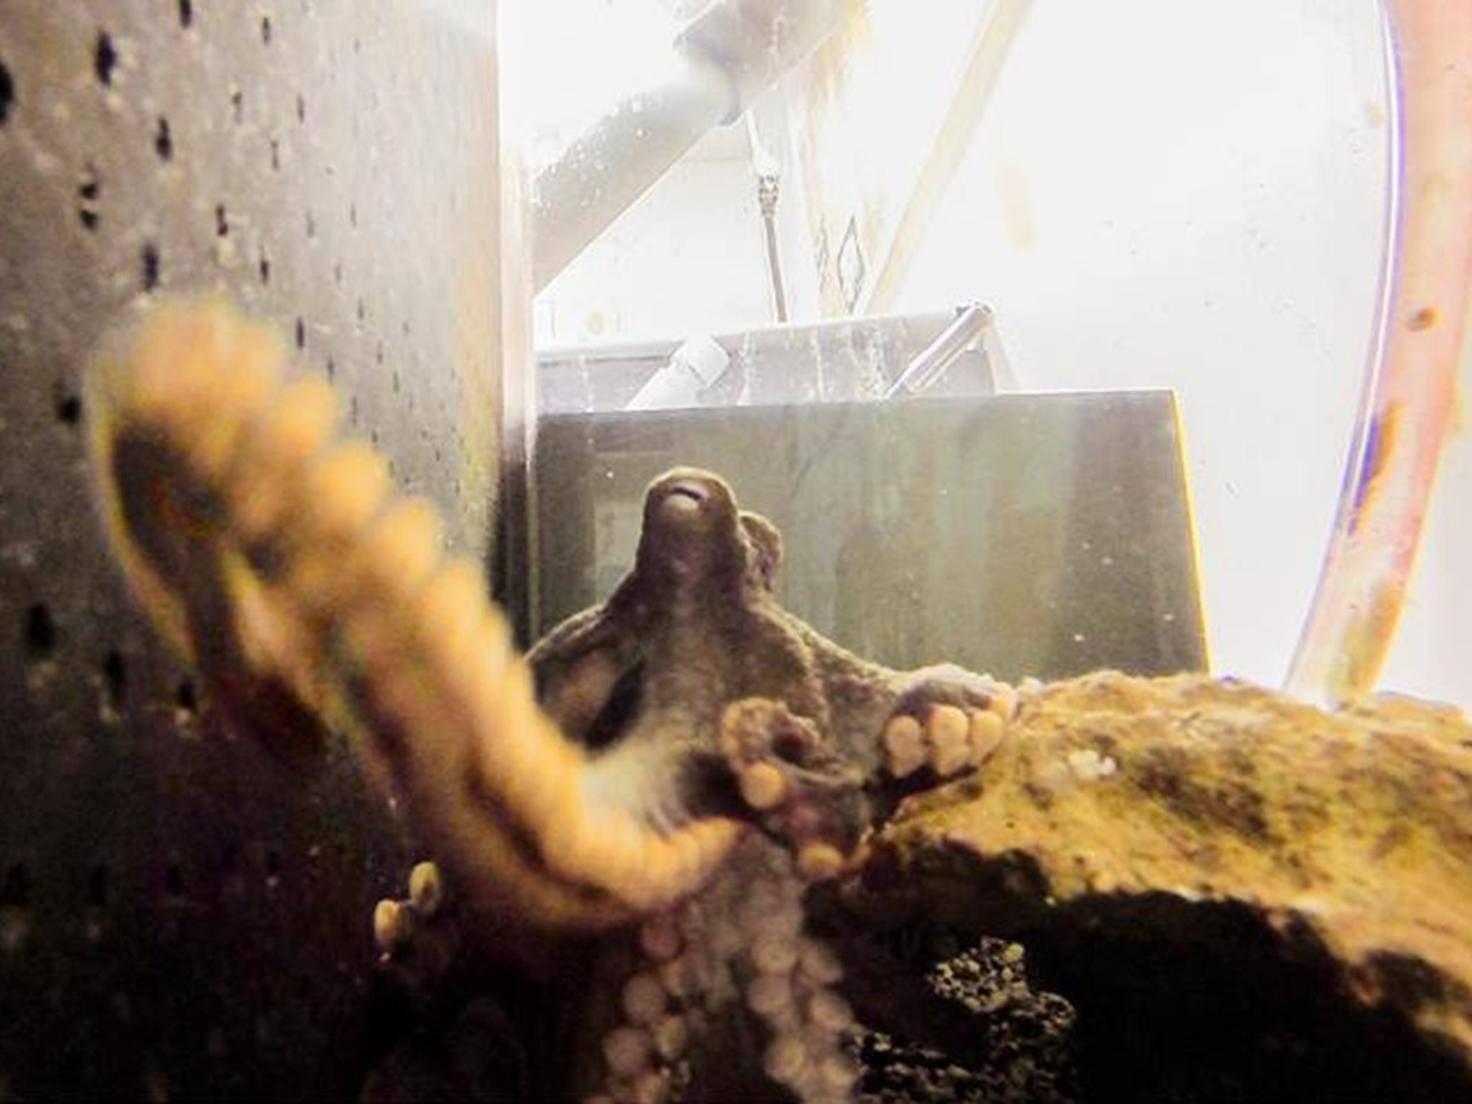 Octopus GoPro